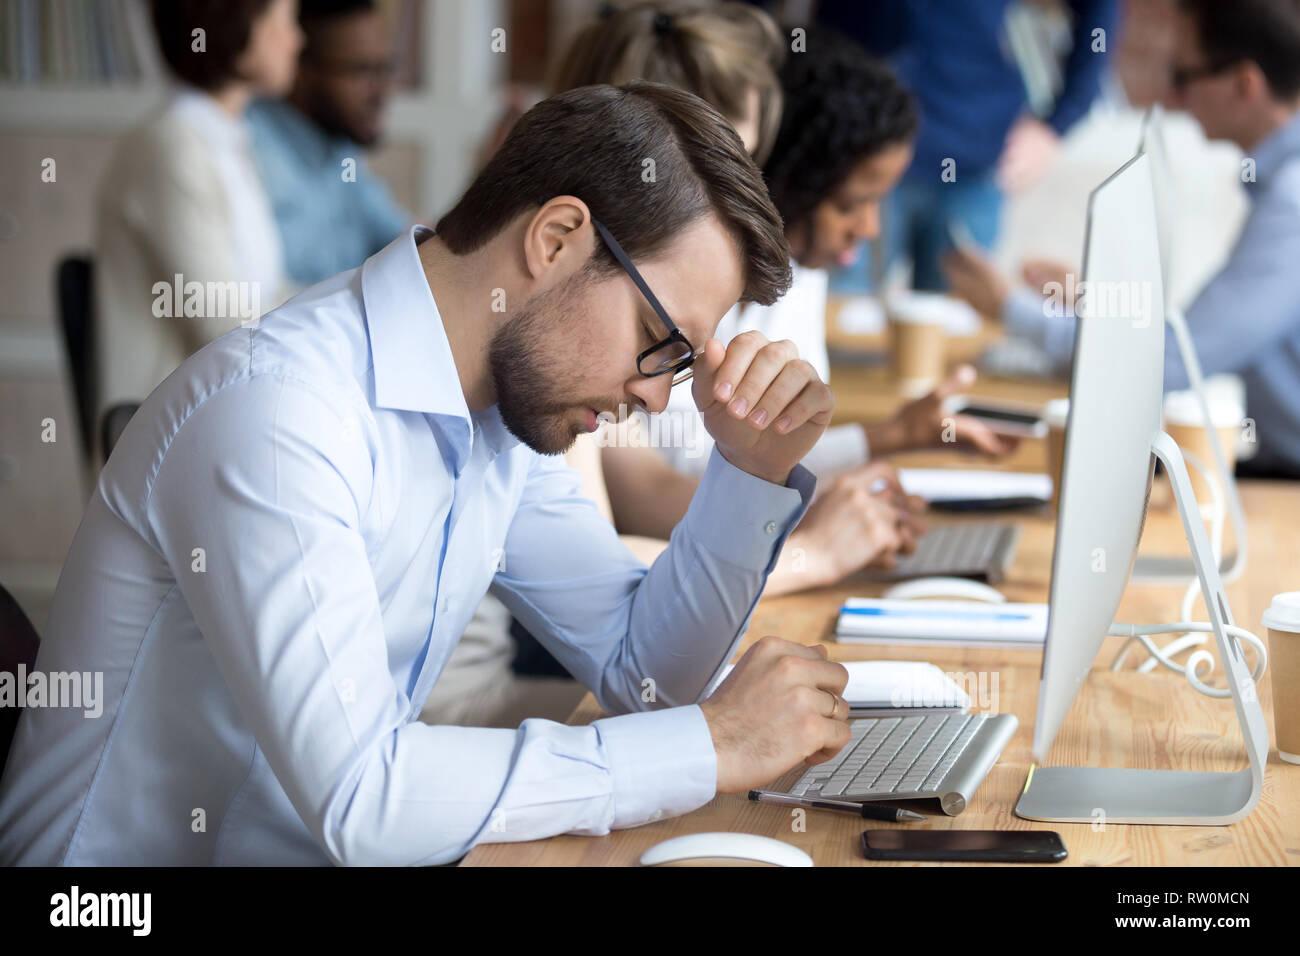 Businessman feels desperate having serious problem at work - Stock Image